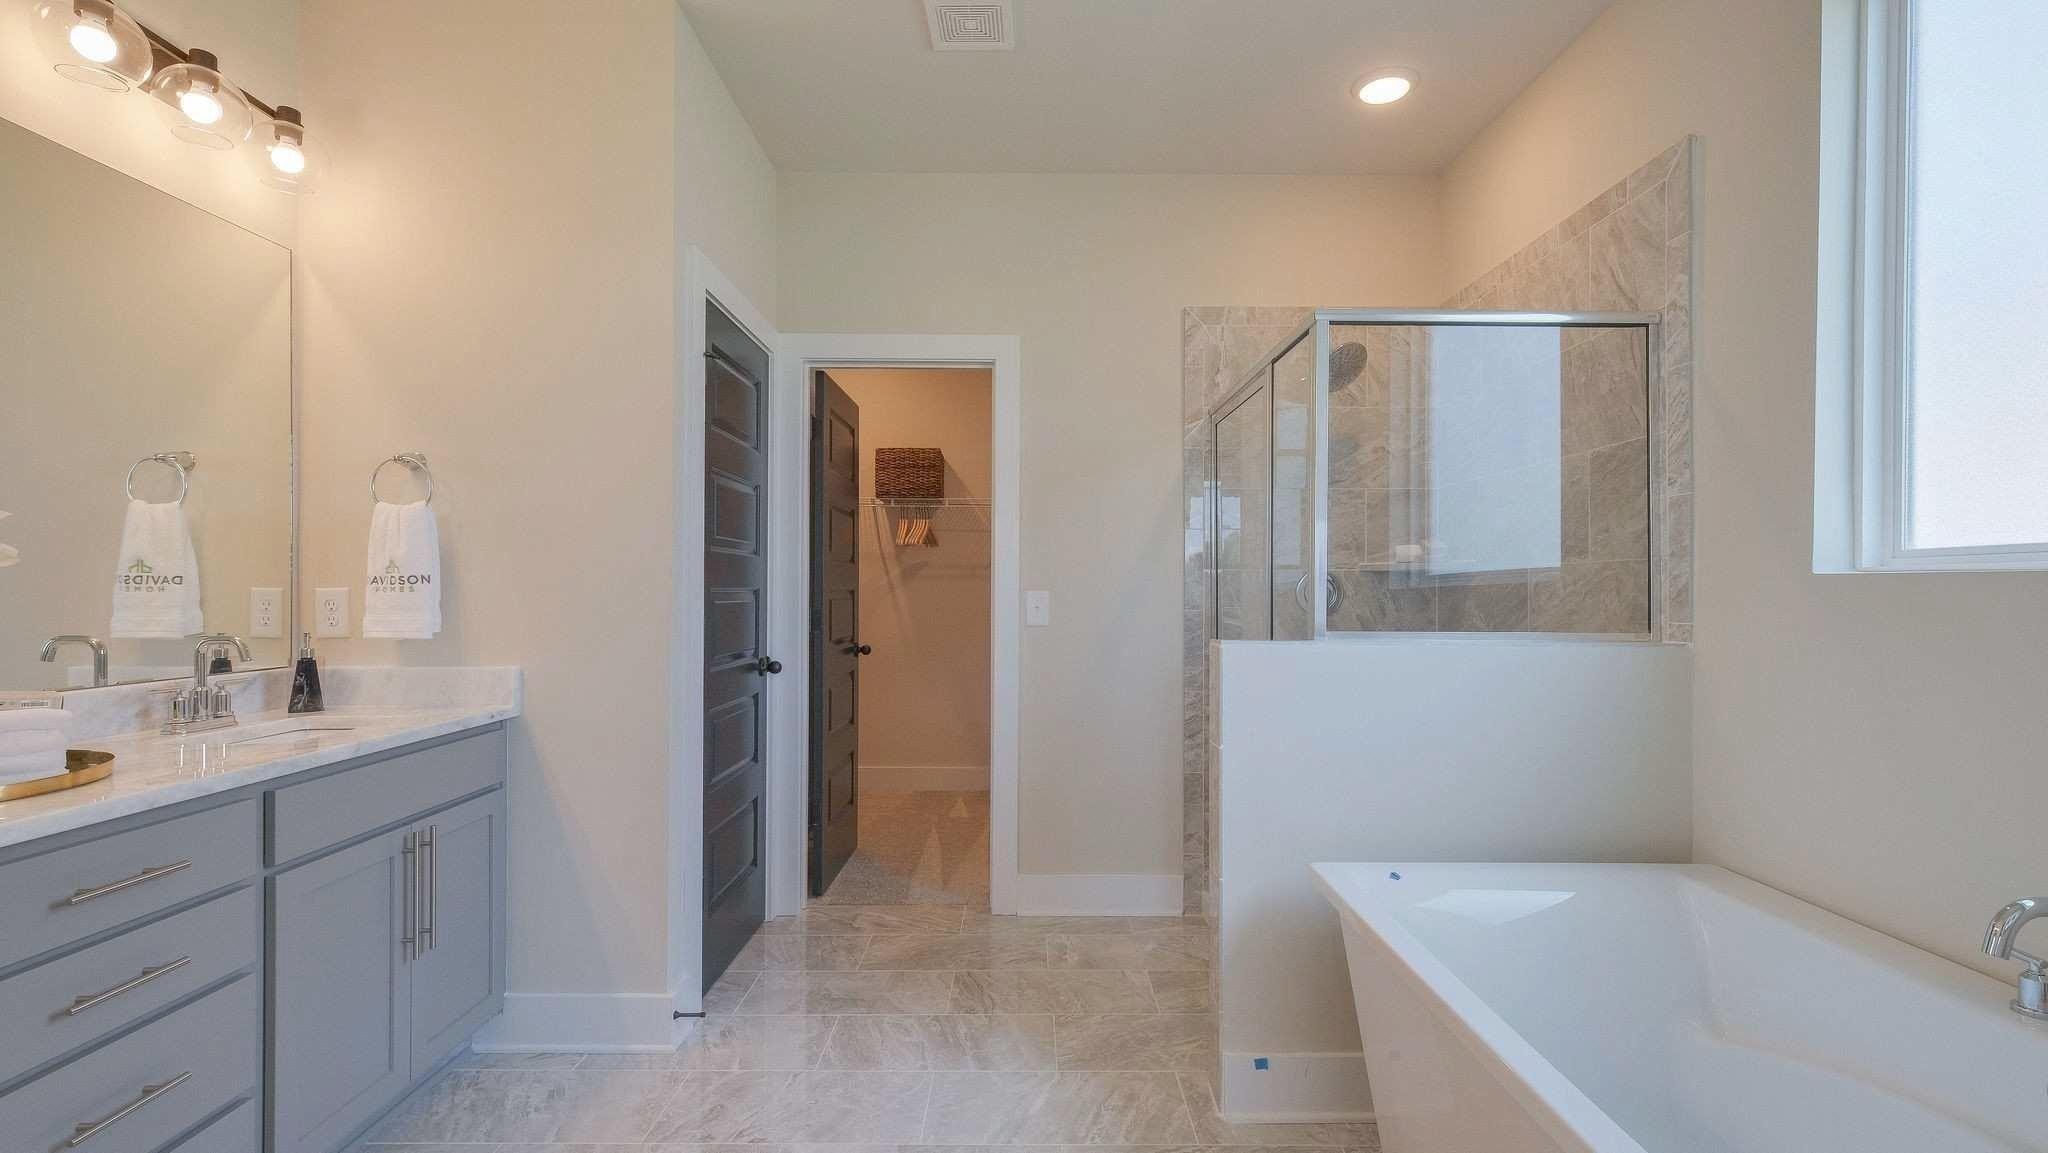 Bathroom featured in The Ridgeport B with 3-Car Garage By Davidson Homes LLC in Nashville, TN